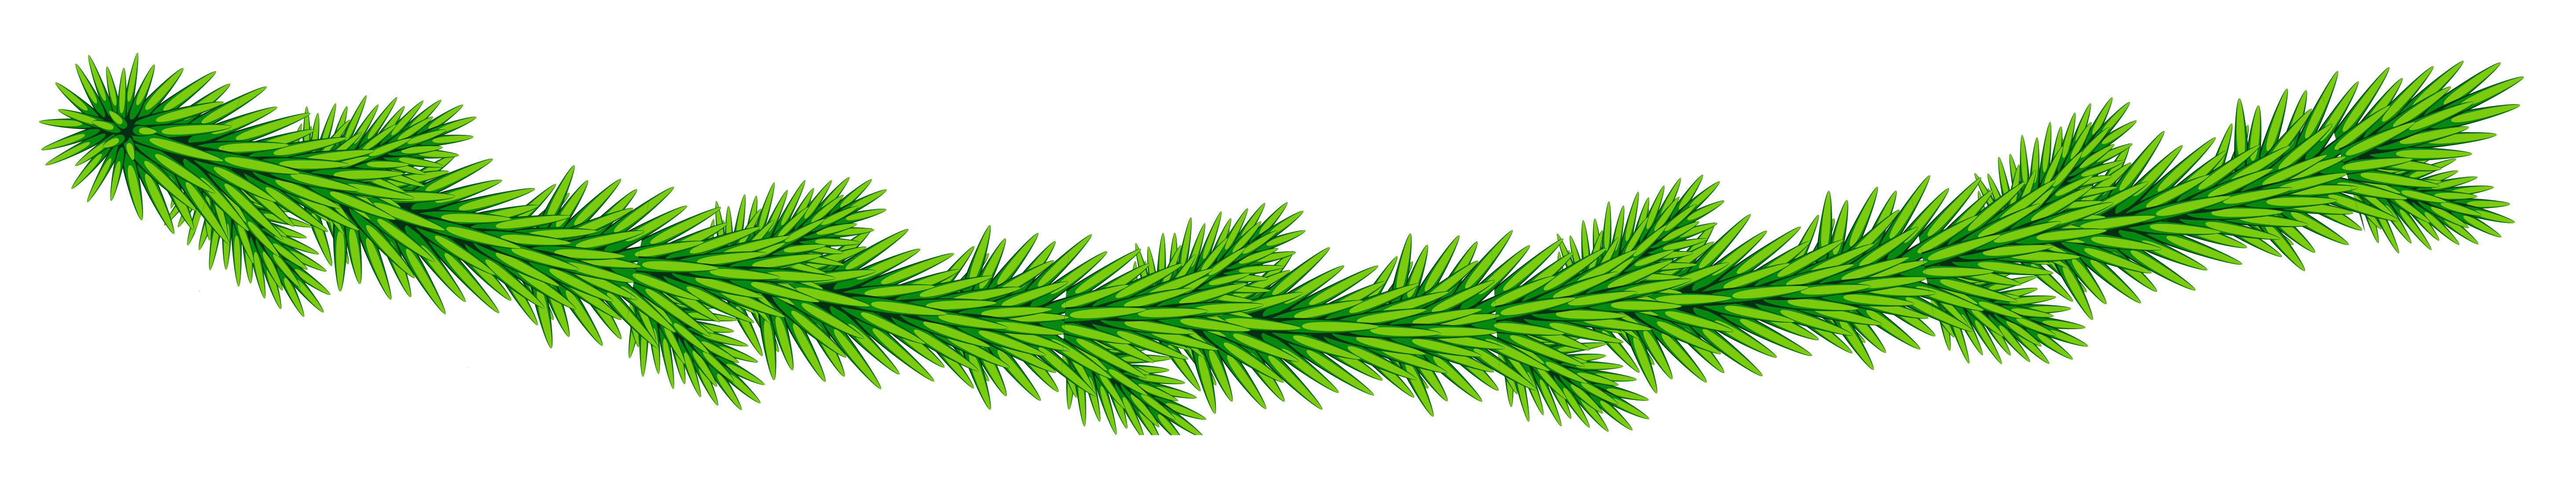 Transparent christmas decorative gallery. Garland clipart green garland